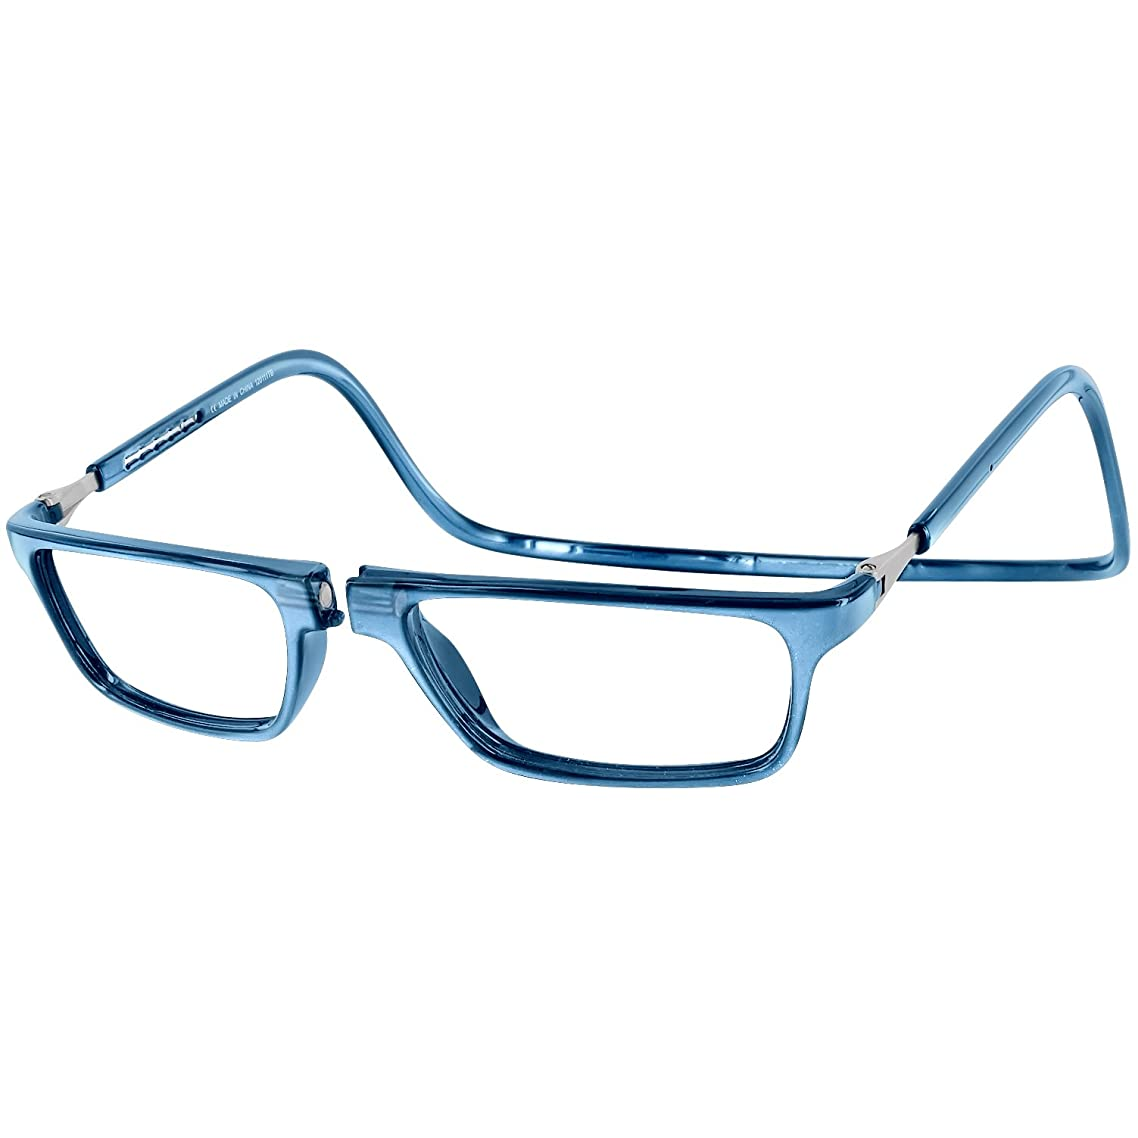 Clic Magnetic Executive Reading Glasses